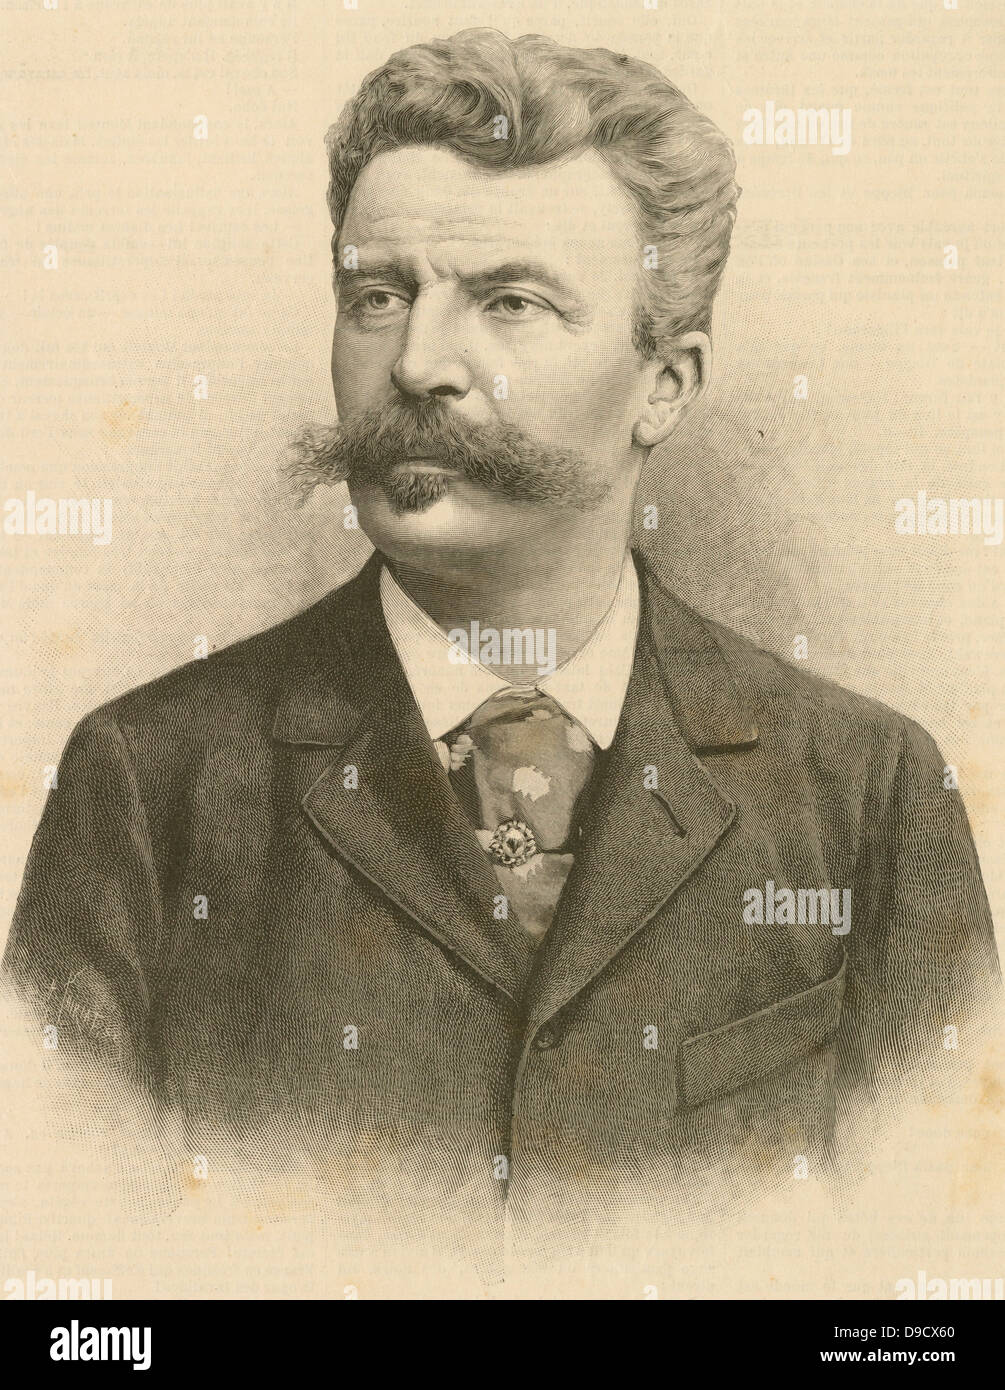 Photo De Guy De Maupassant : photo, maupassant, Henri, Albert), Maupassant, (1850-1893), French, Writer, Stock, Photo, Alamy